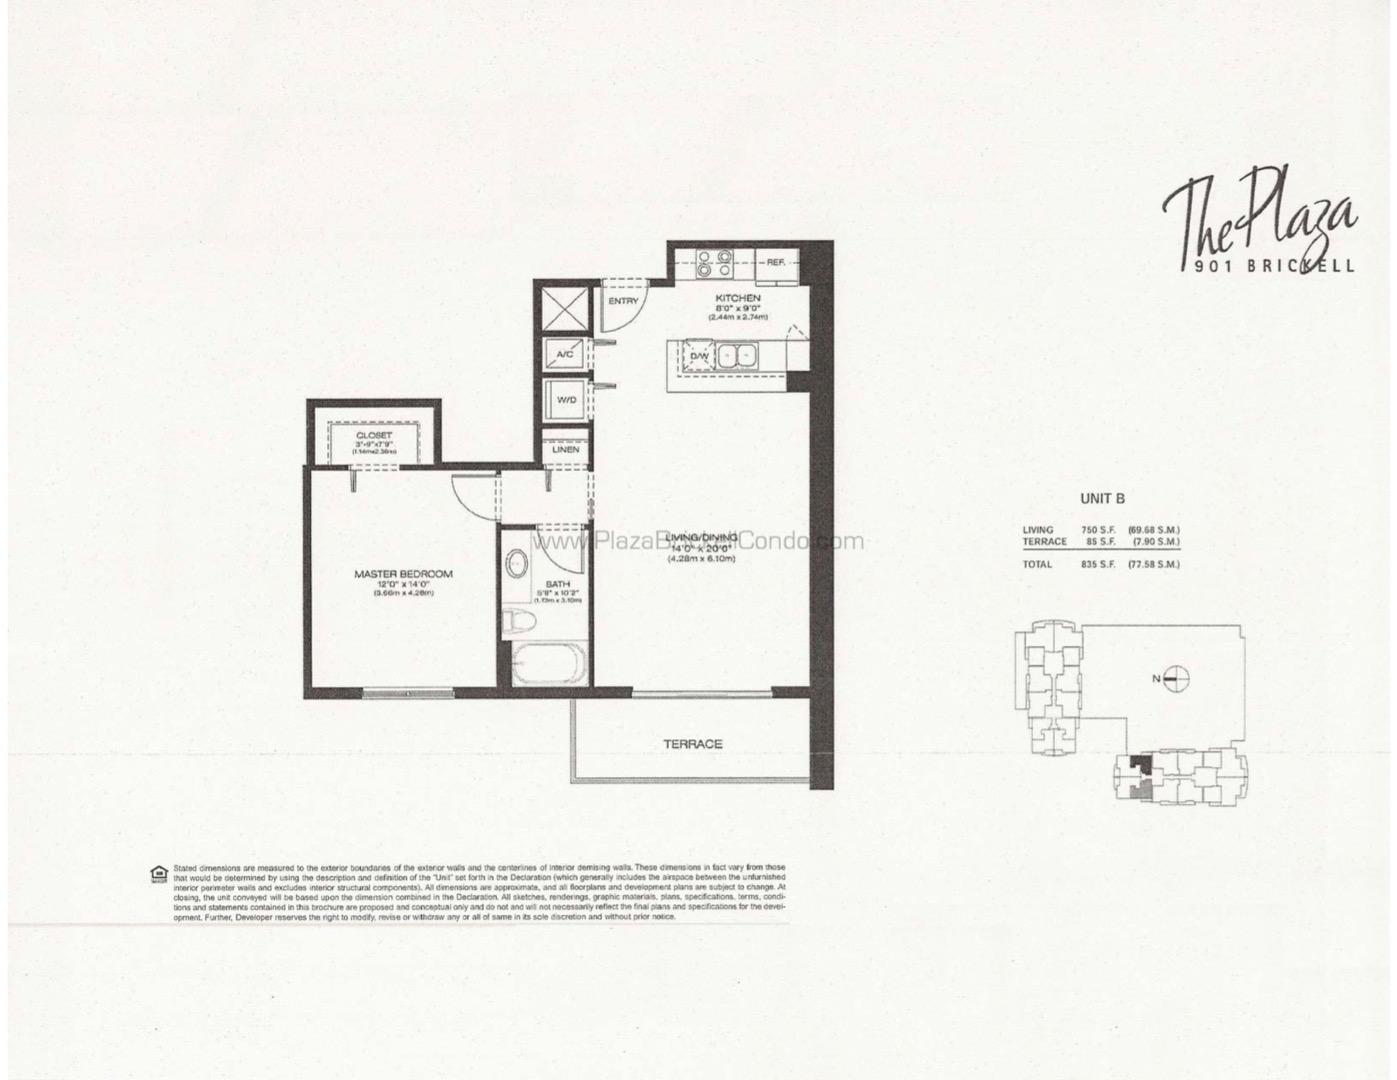 Floor plan image B - 1/1  - 750 sqft image